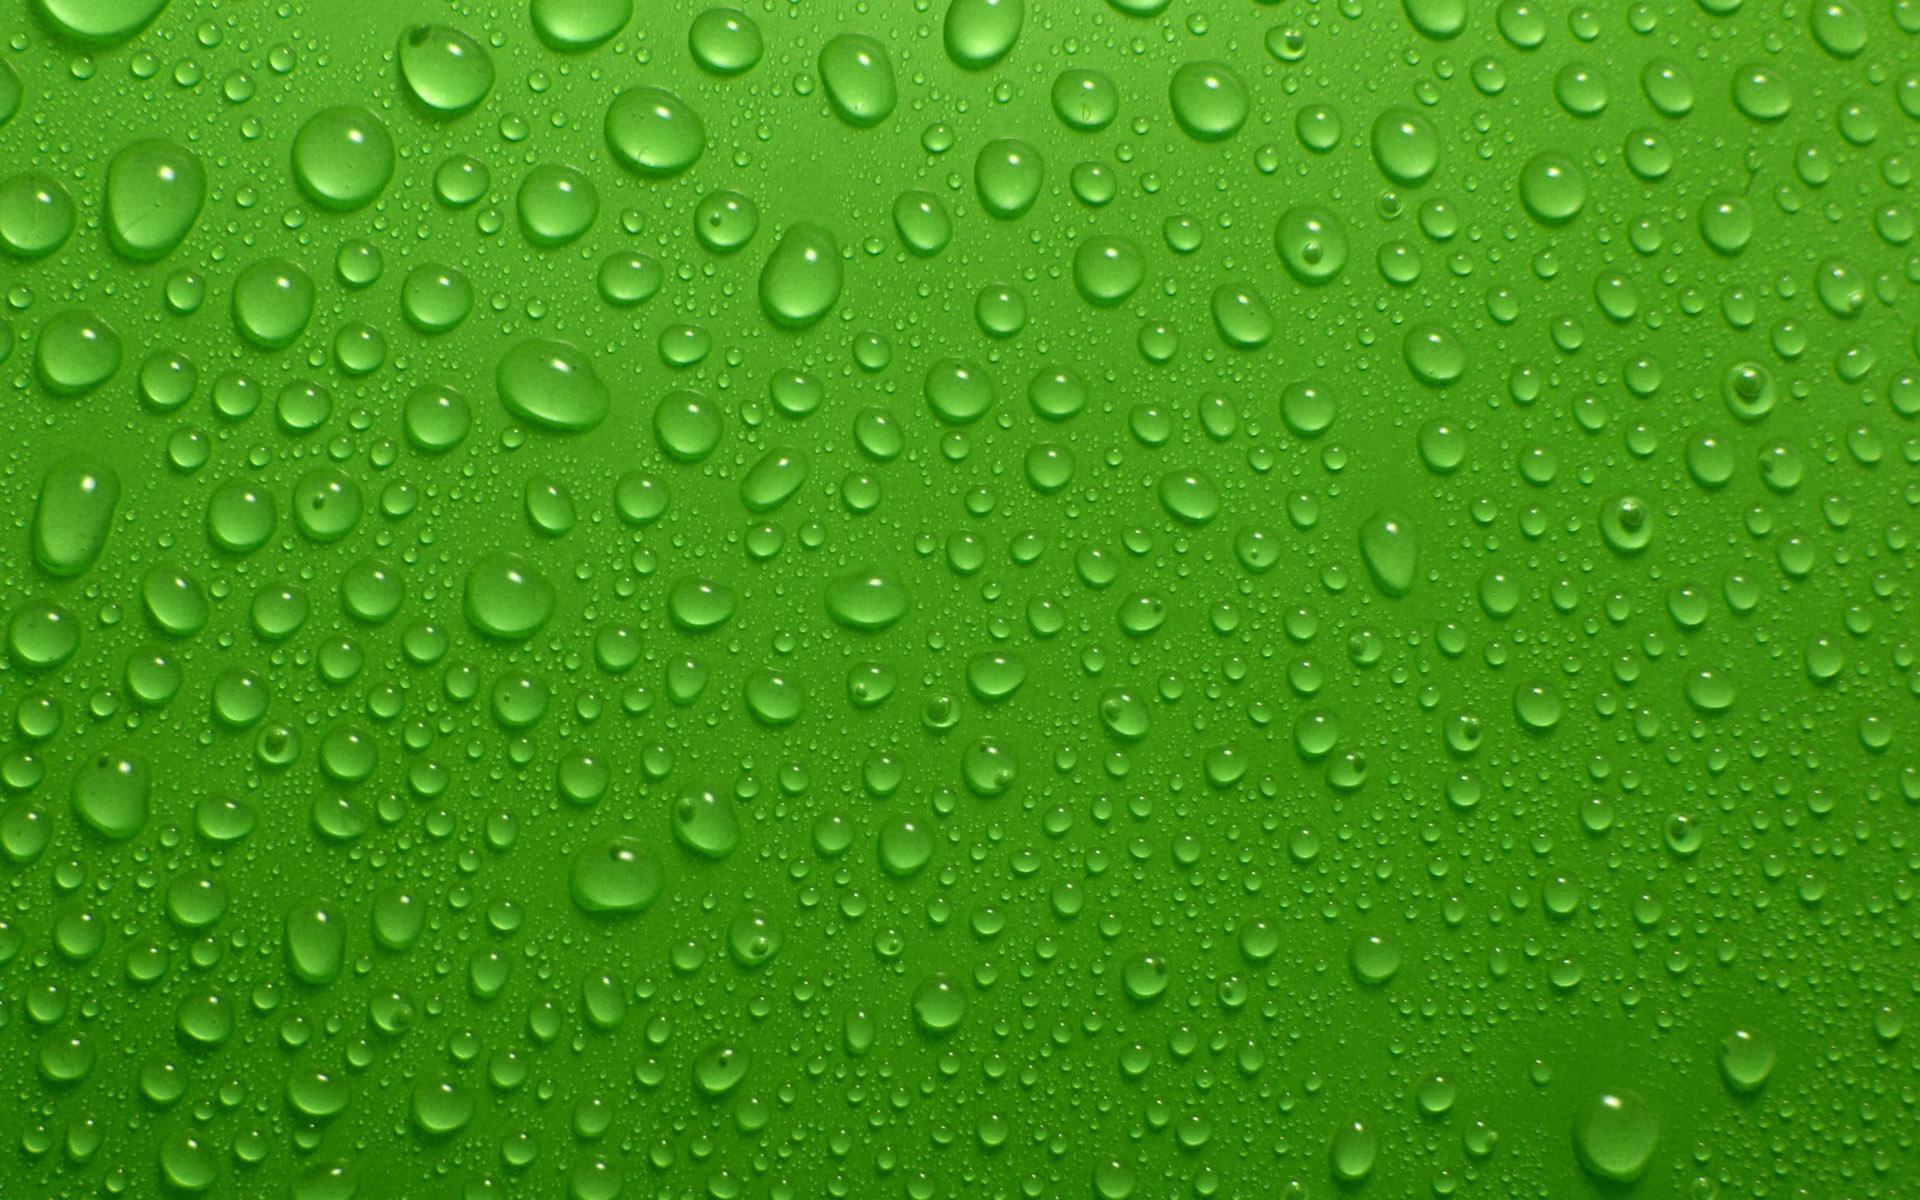 Green water drops HQ Wallpaper